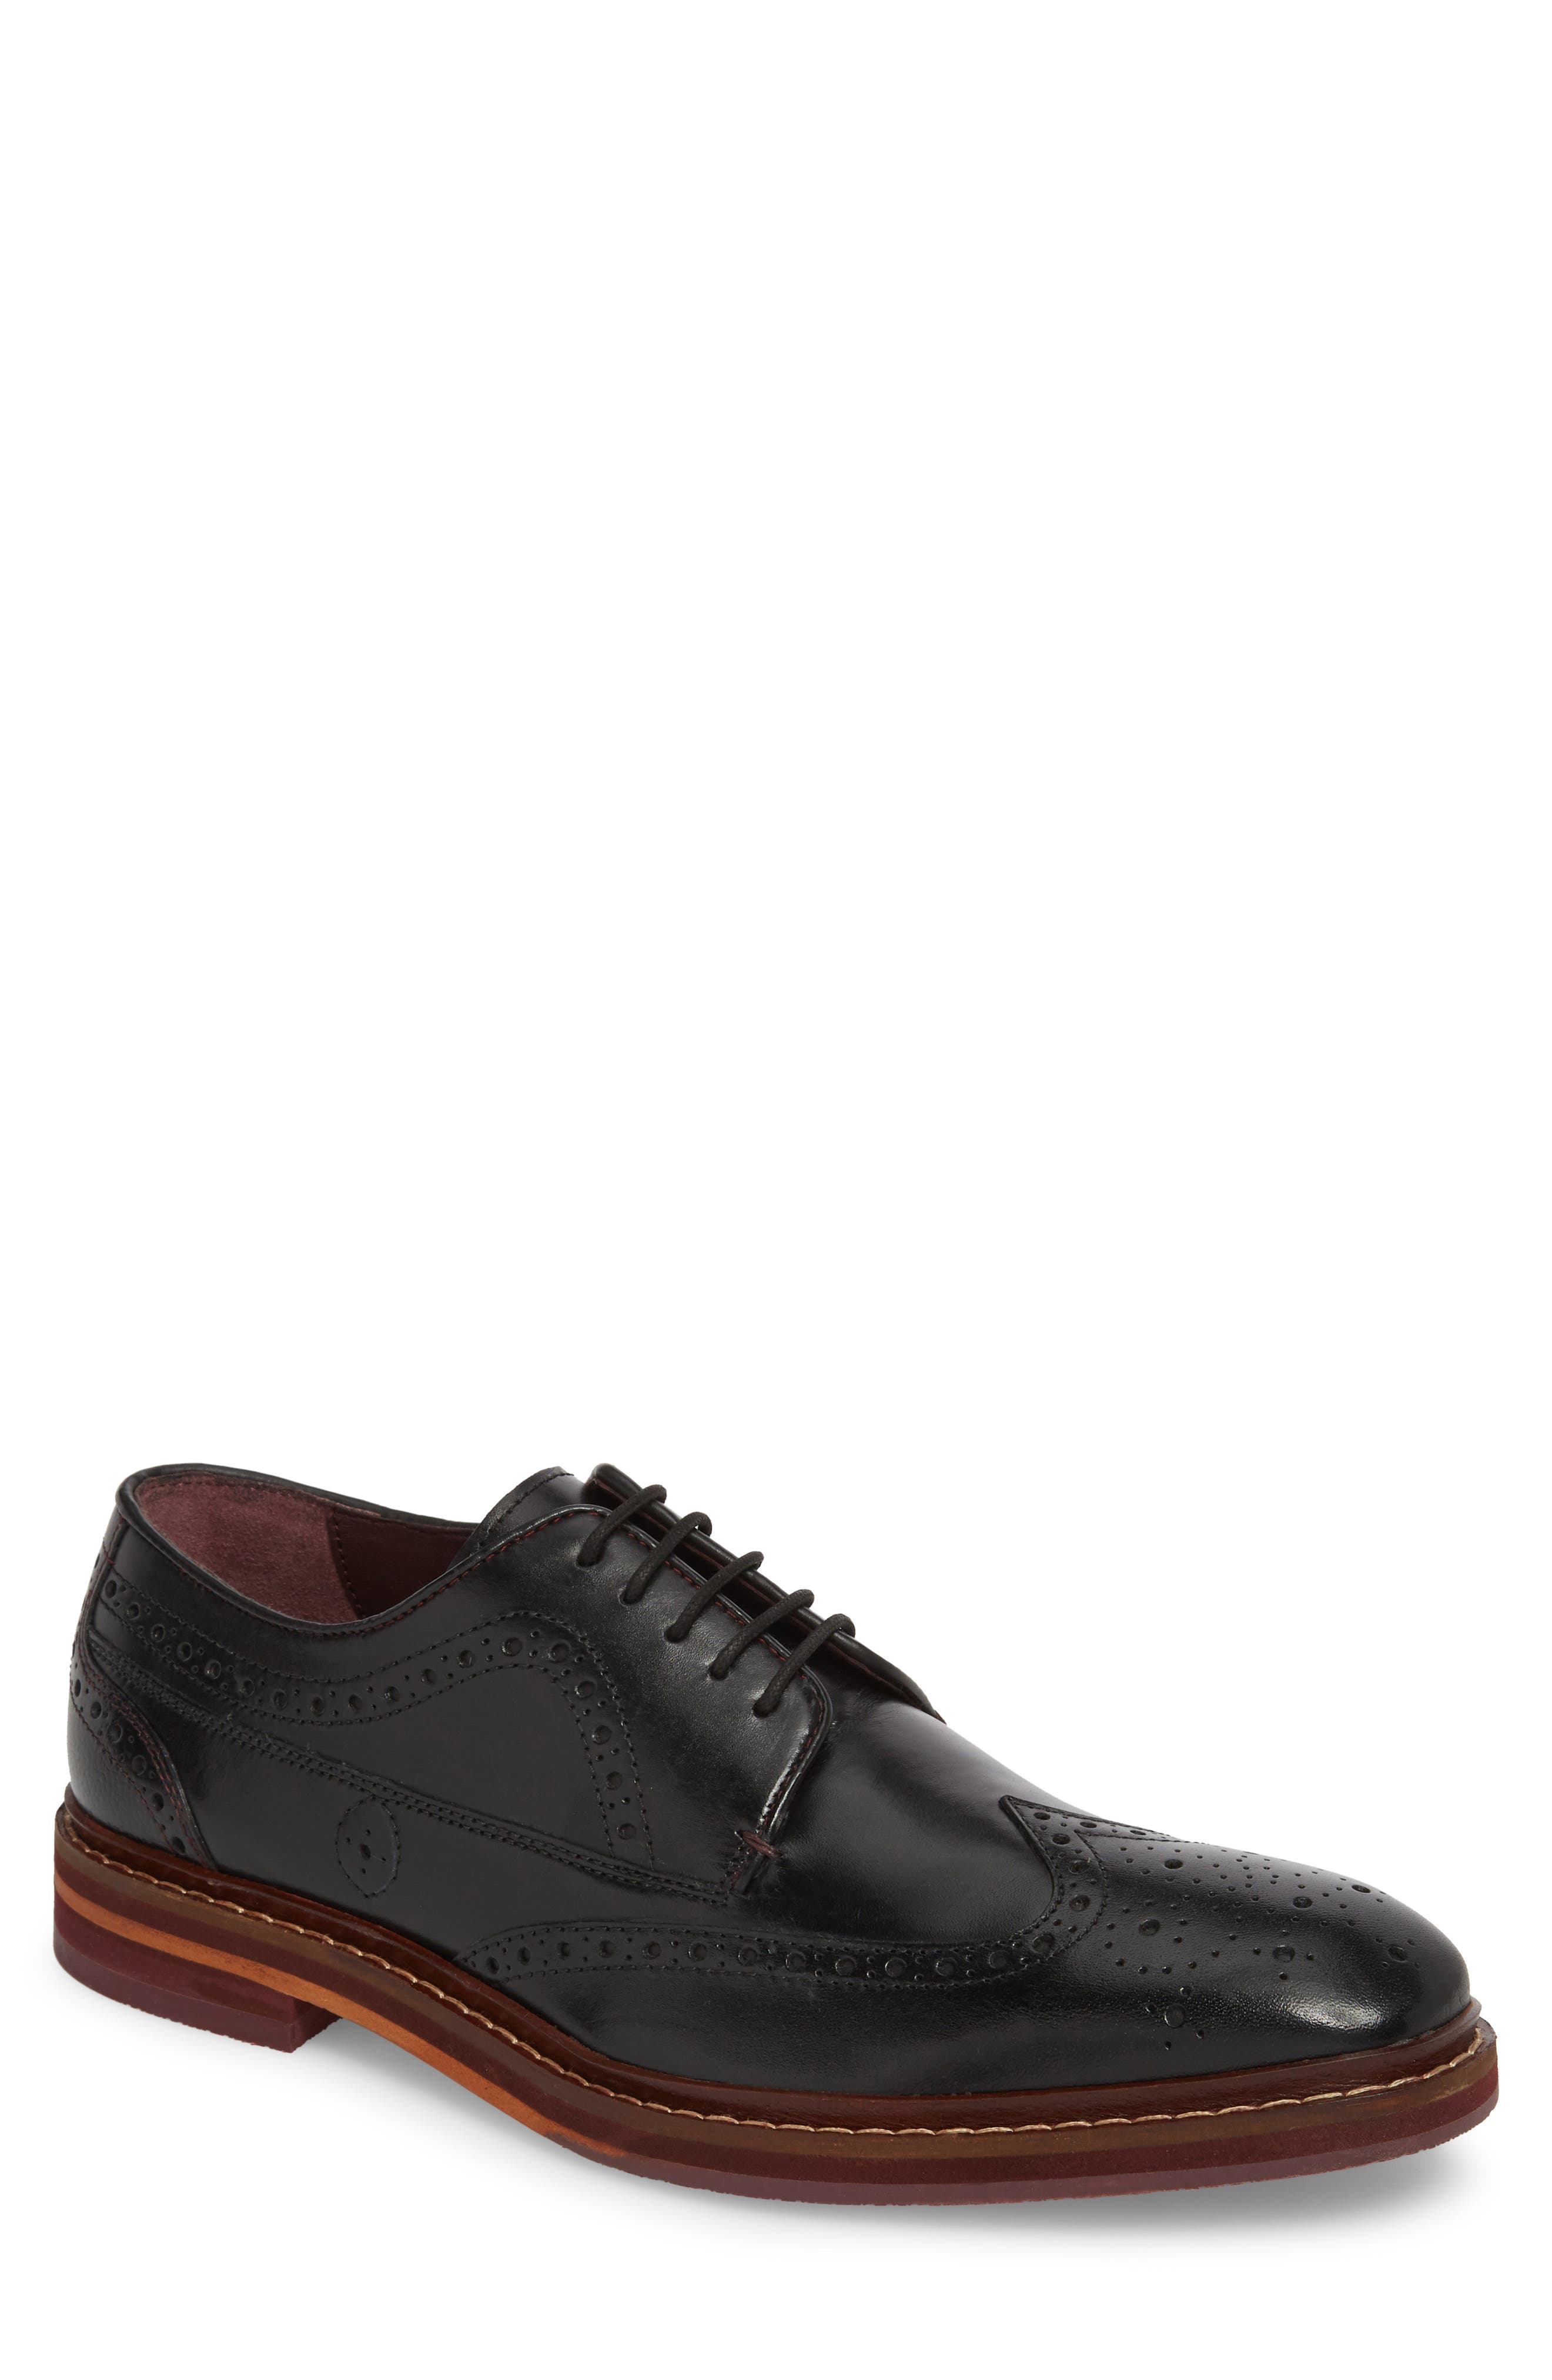 Gourdon Wingtip Derby,                         Main,                         color, Black Leather